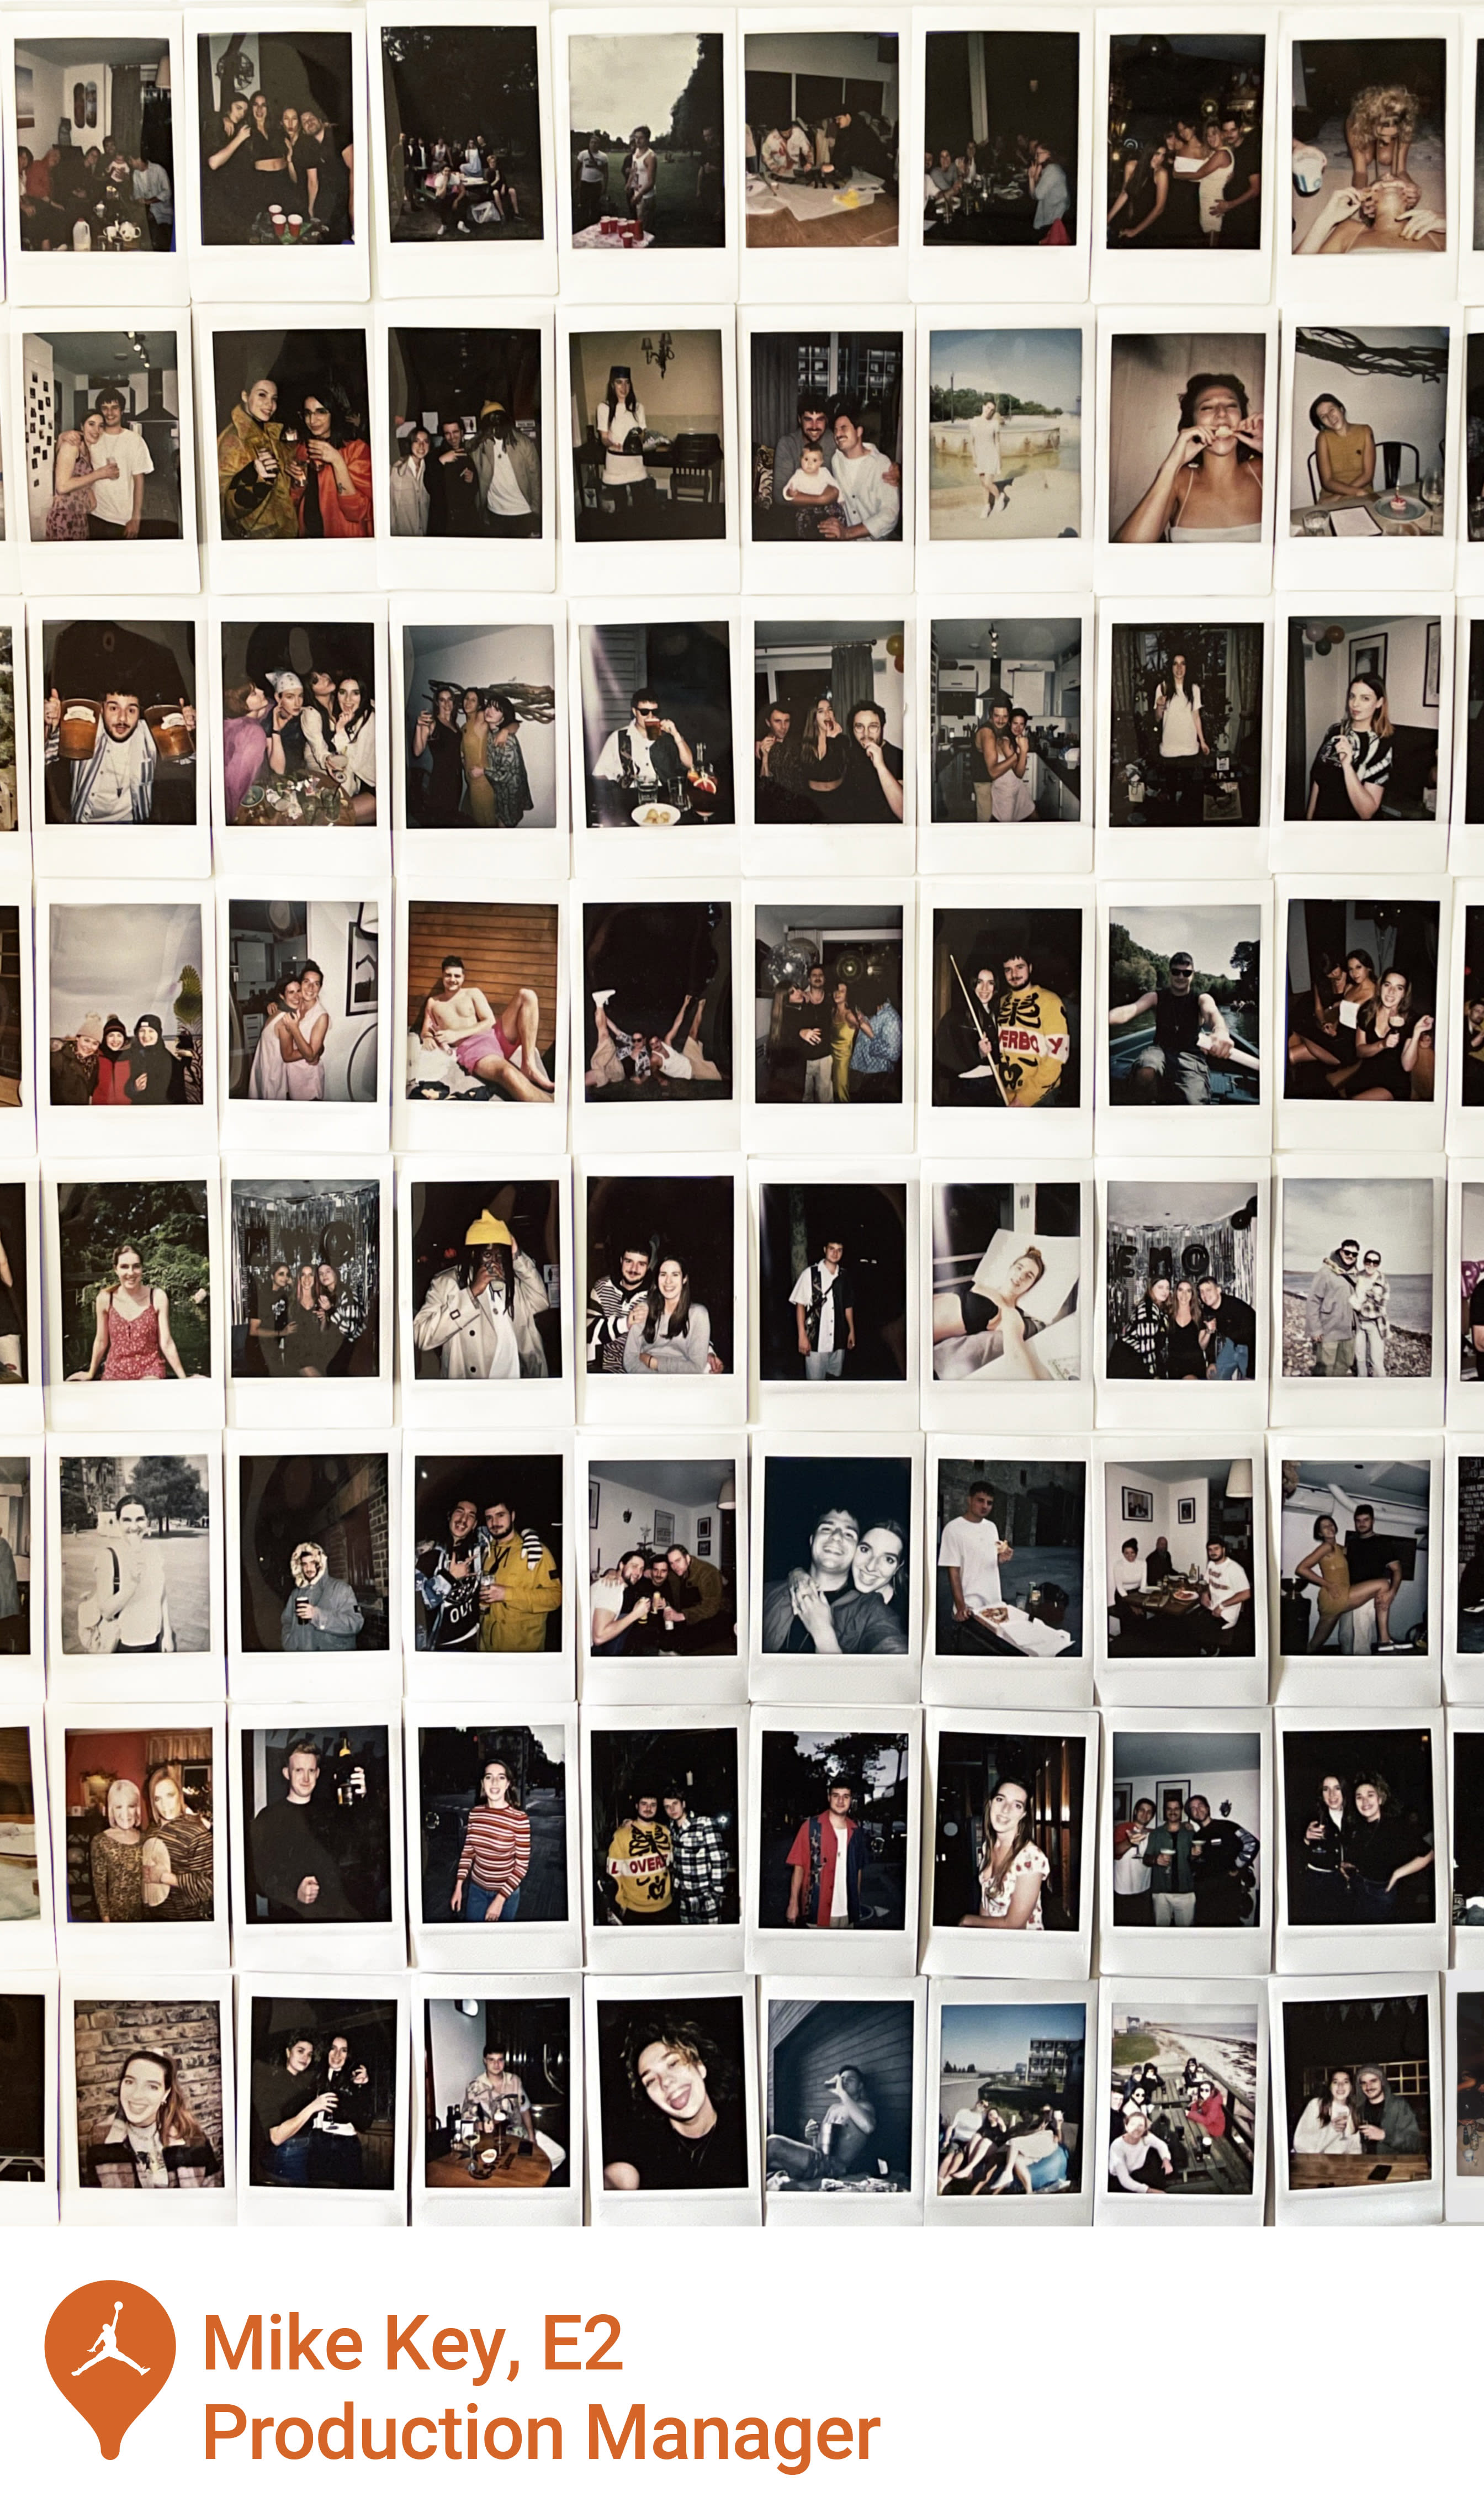 Air Jordan One: A Love Letter to London - Mike Key Polaroids